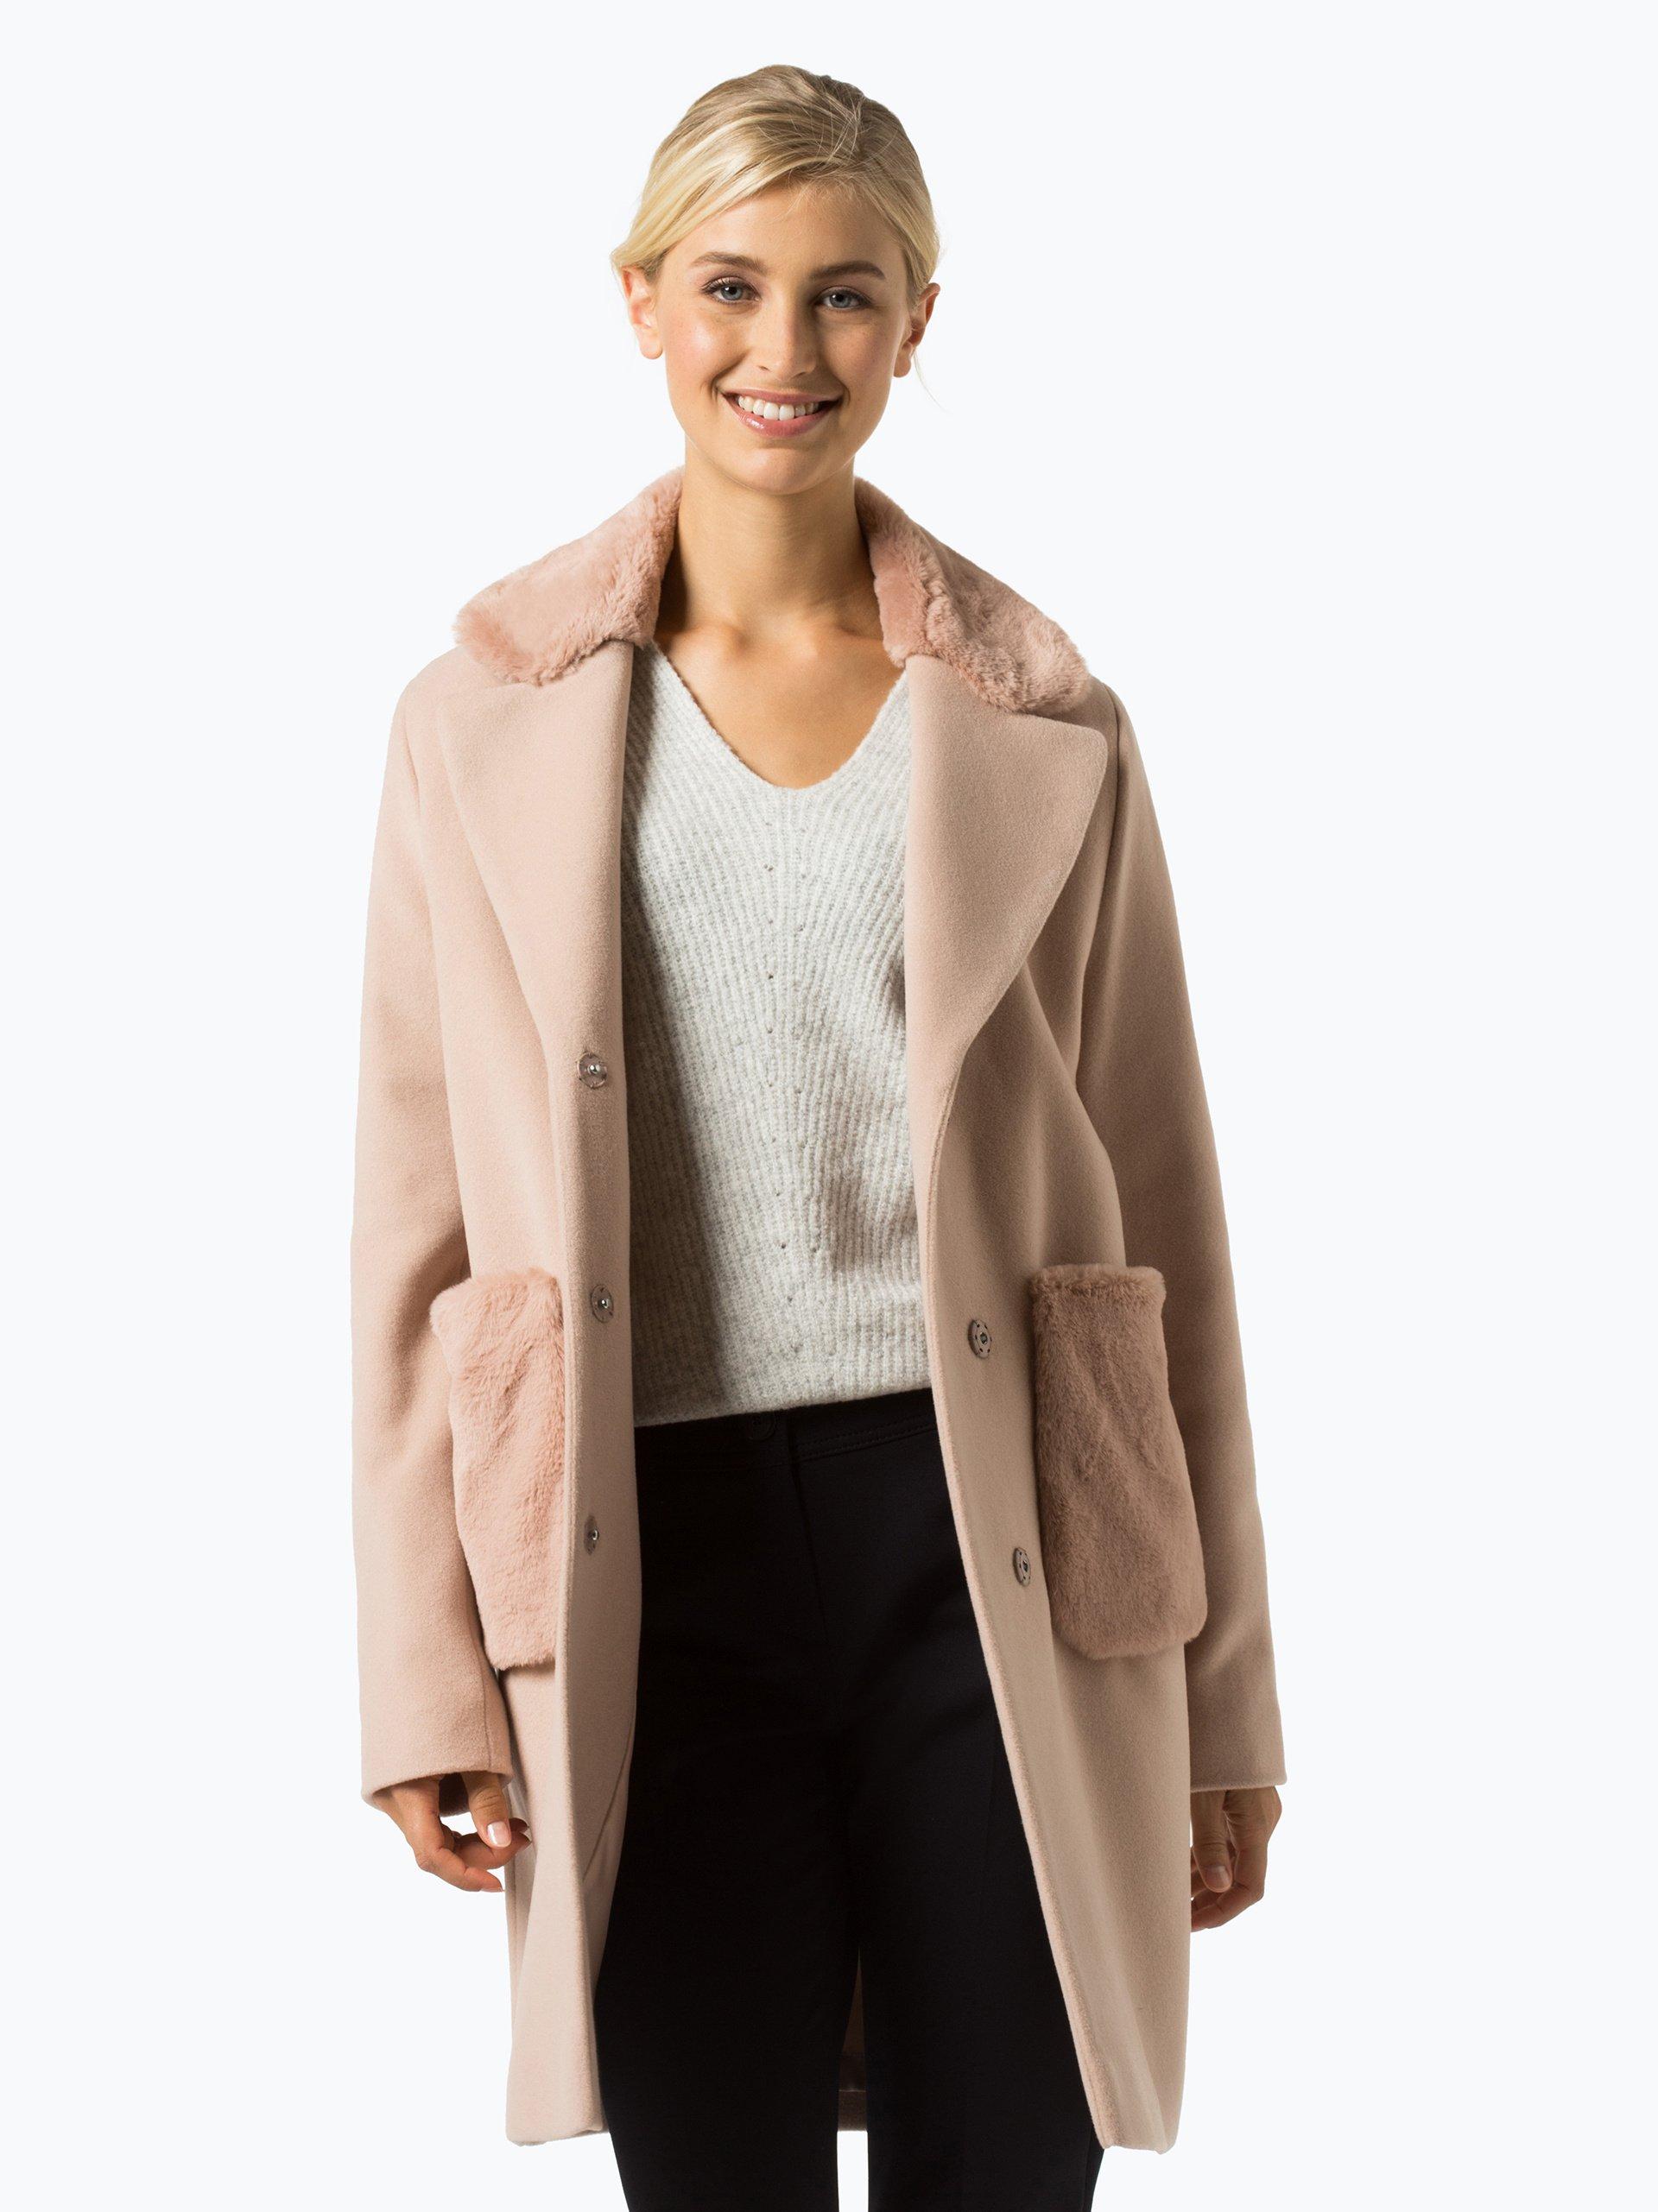 marie lund damen mantel mit cashmere anteil altrosa uni online kaufen vangraaf com. Black Bedroom Furniture Sets. Home Design Ideas